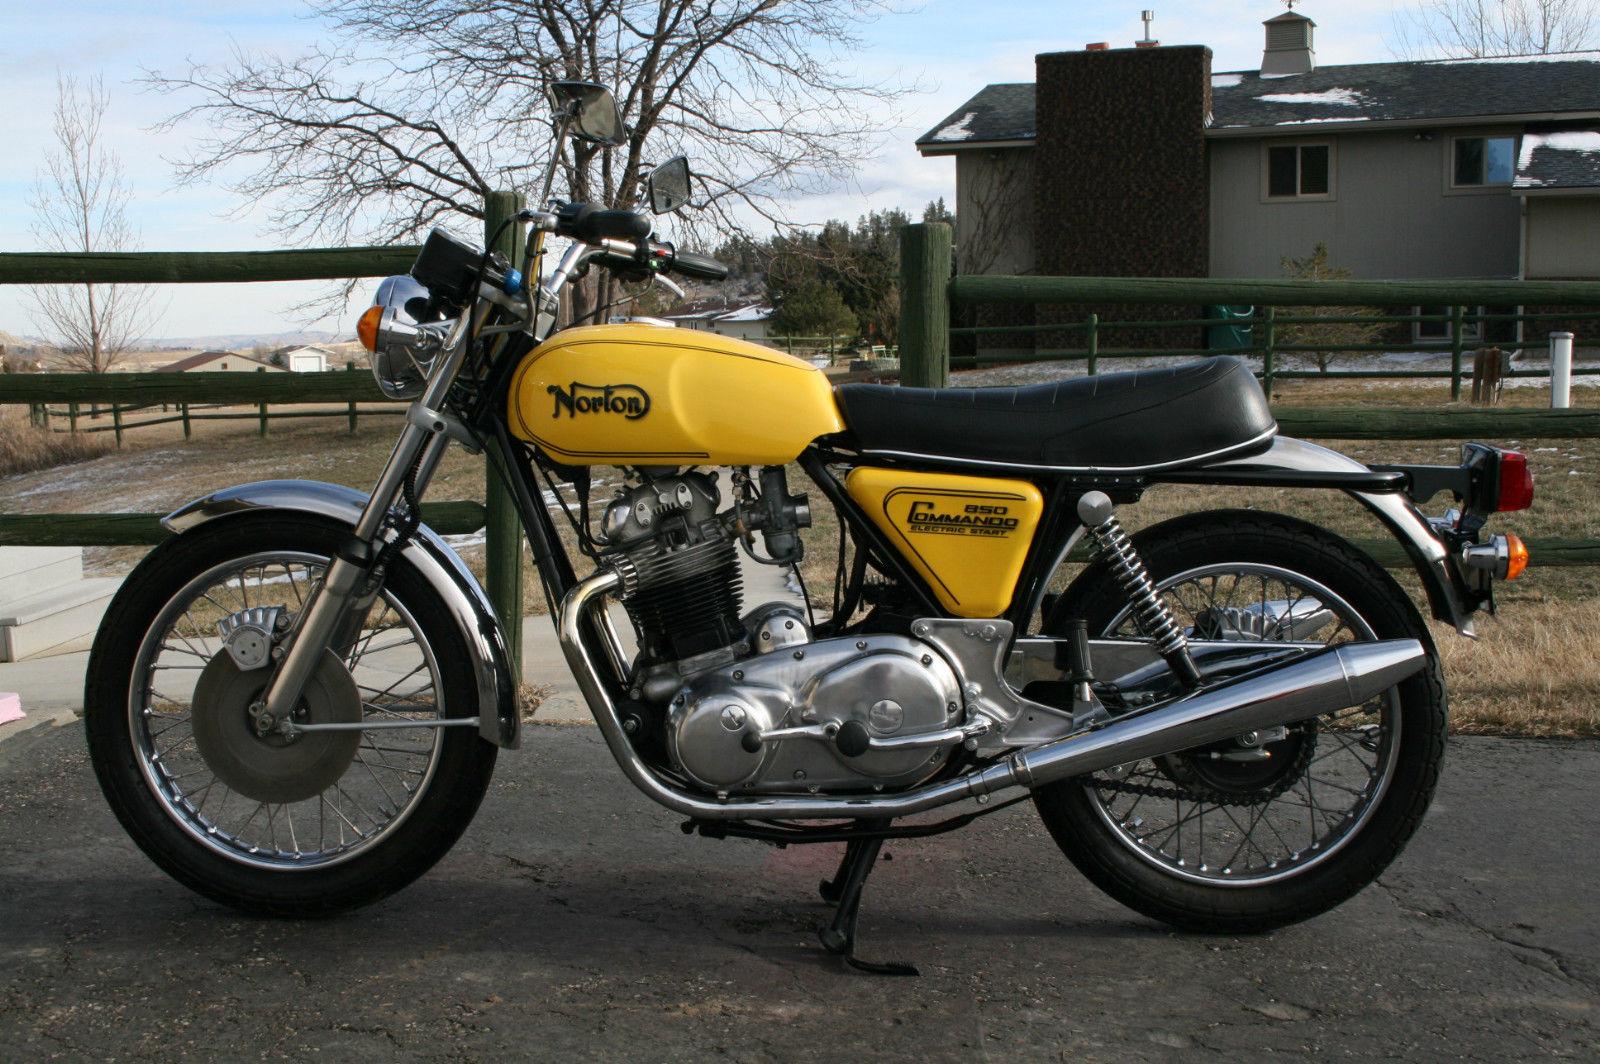 Norton Commando 850 - 1975 - Silencer, Exhaust, Muffler, Motor ans Transmission.